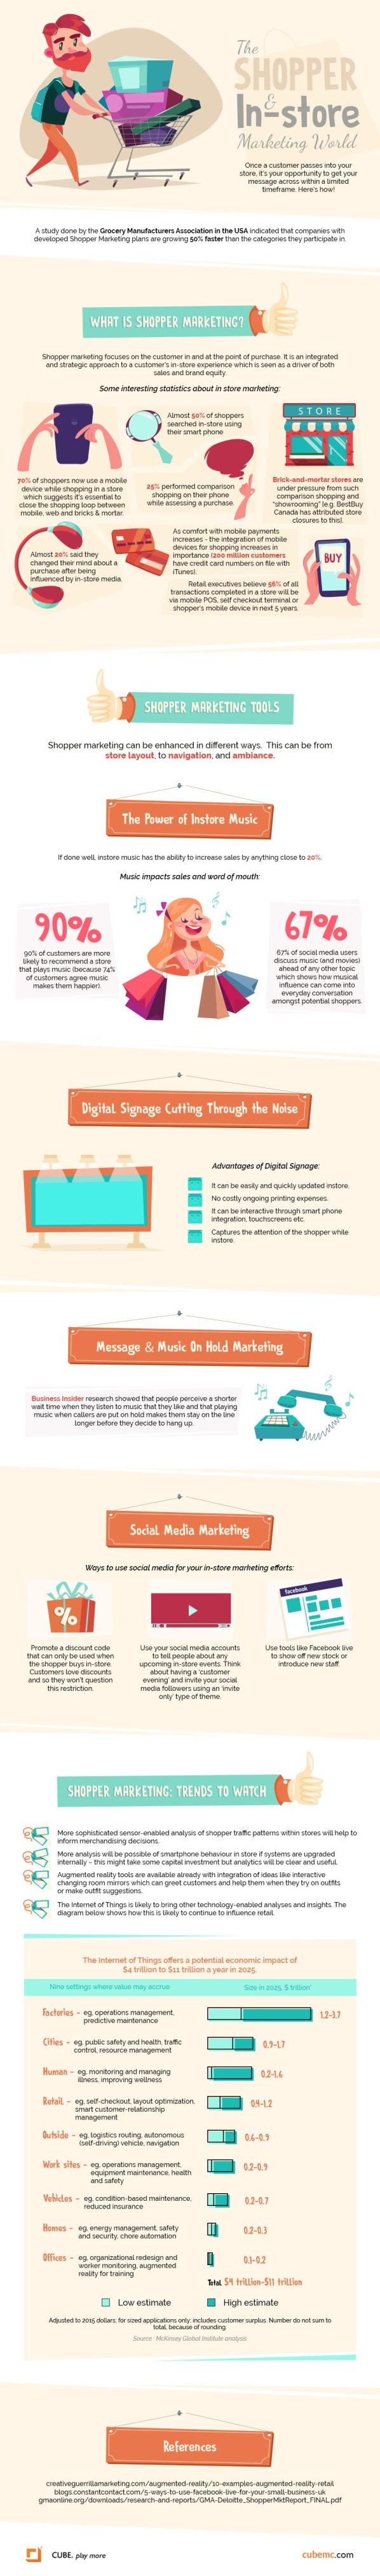 Shopper-Marketing- infographic